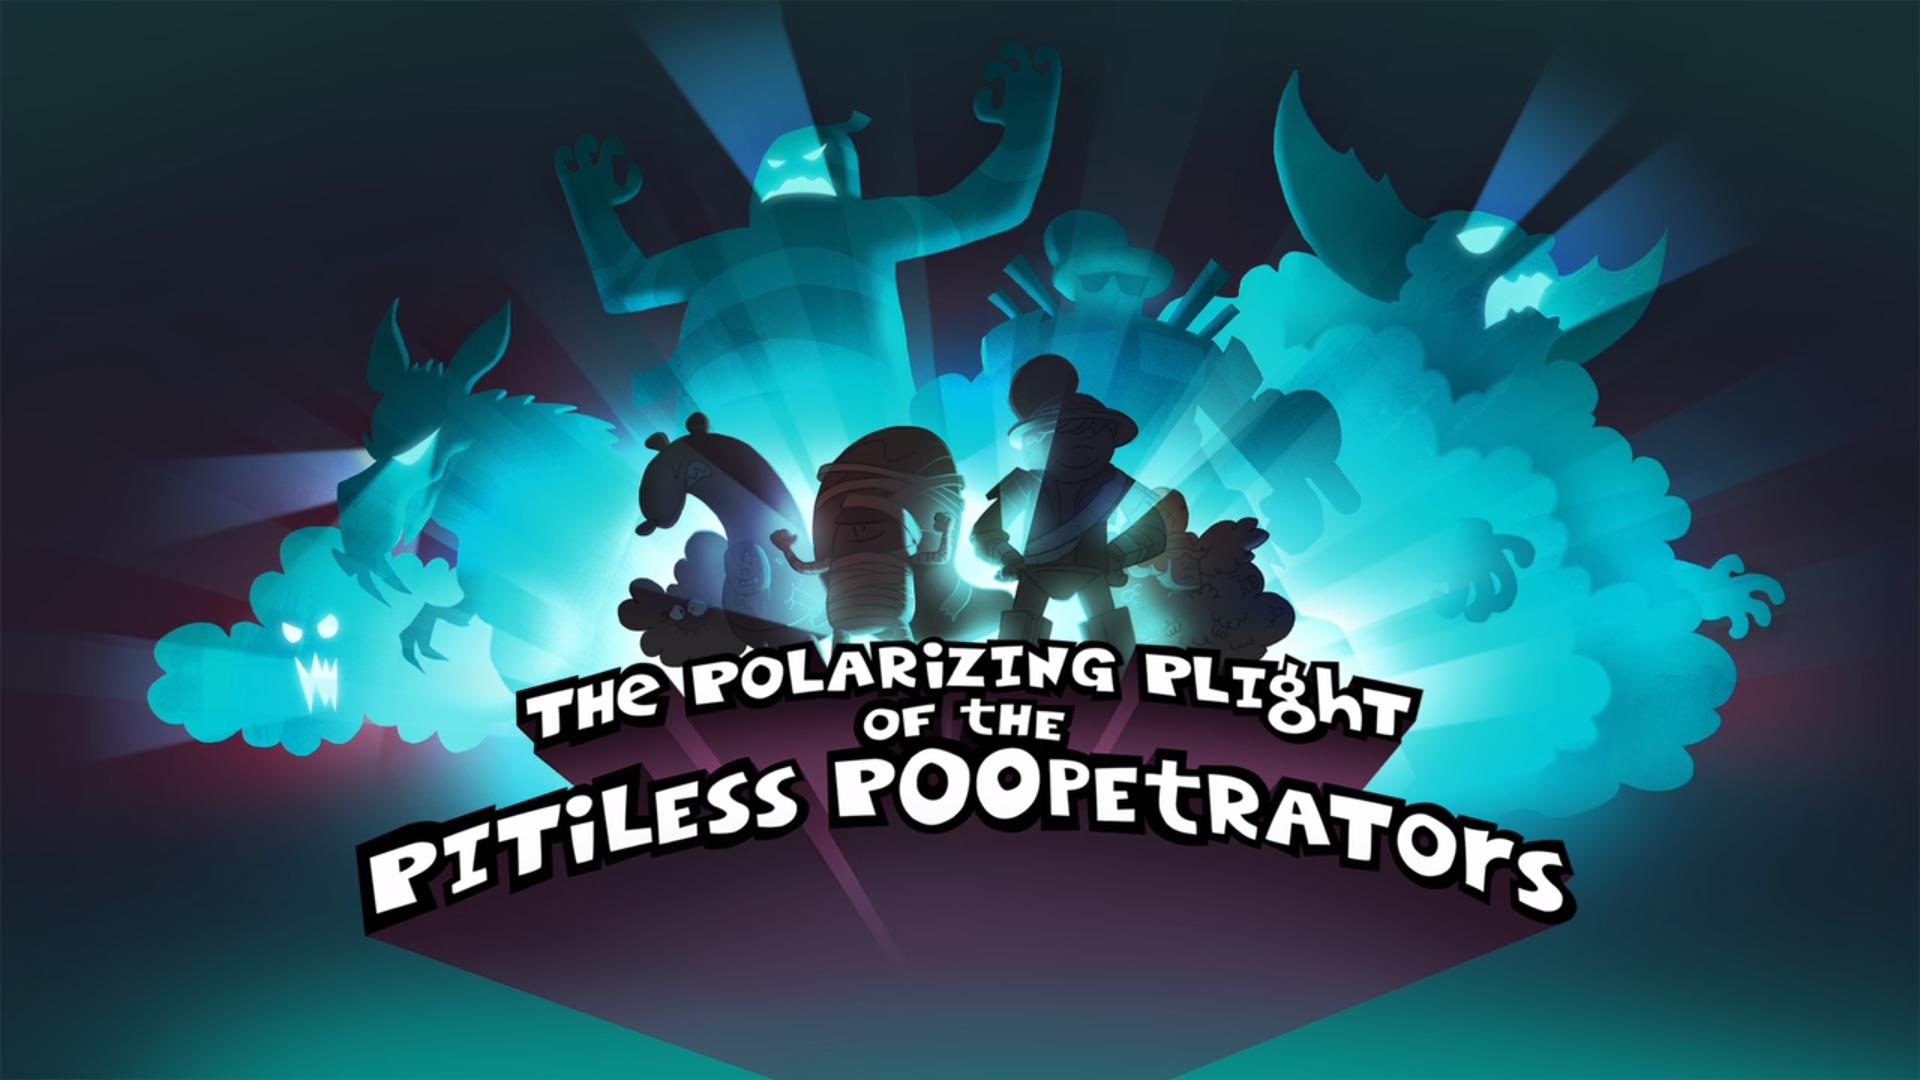 The Polarizing Plight of the Pitiless Poopetrators